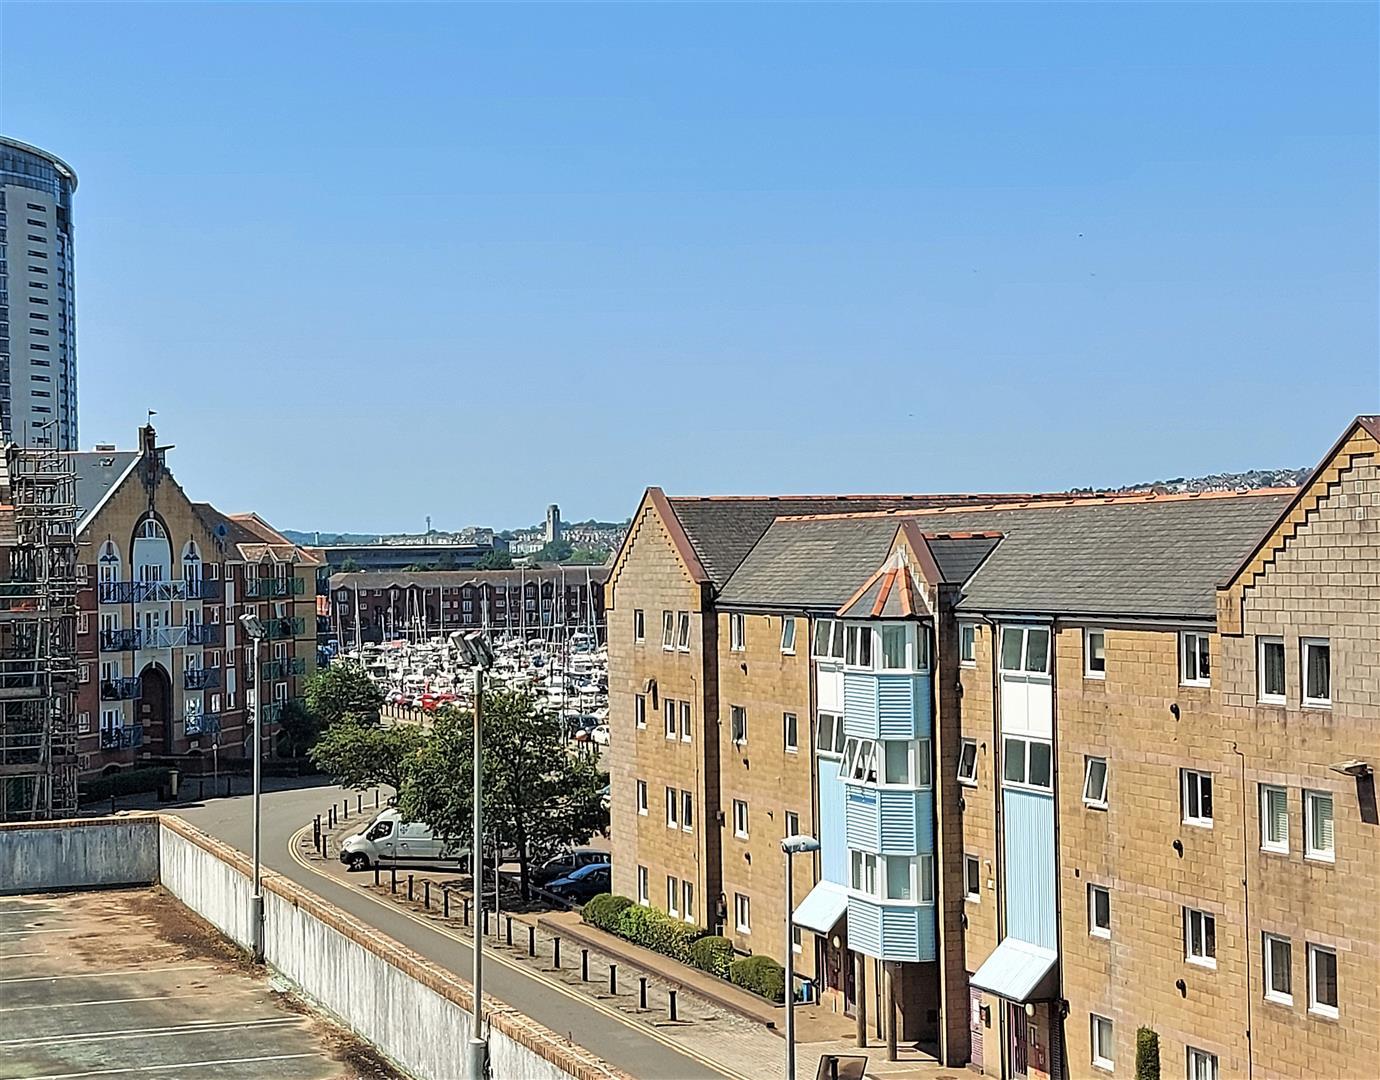 St. Christophers Court, Marina, Swansea, SA1 1UA